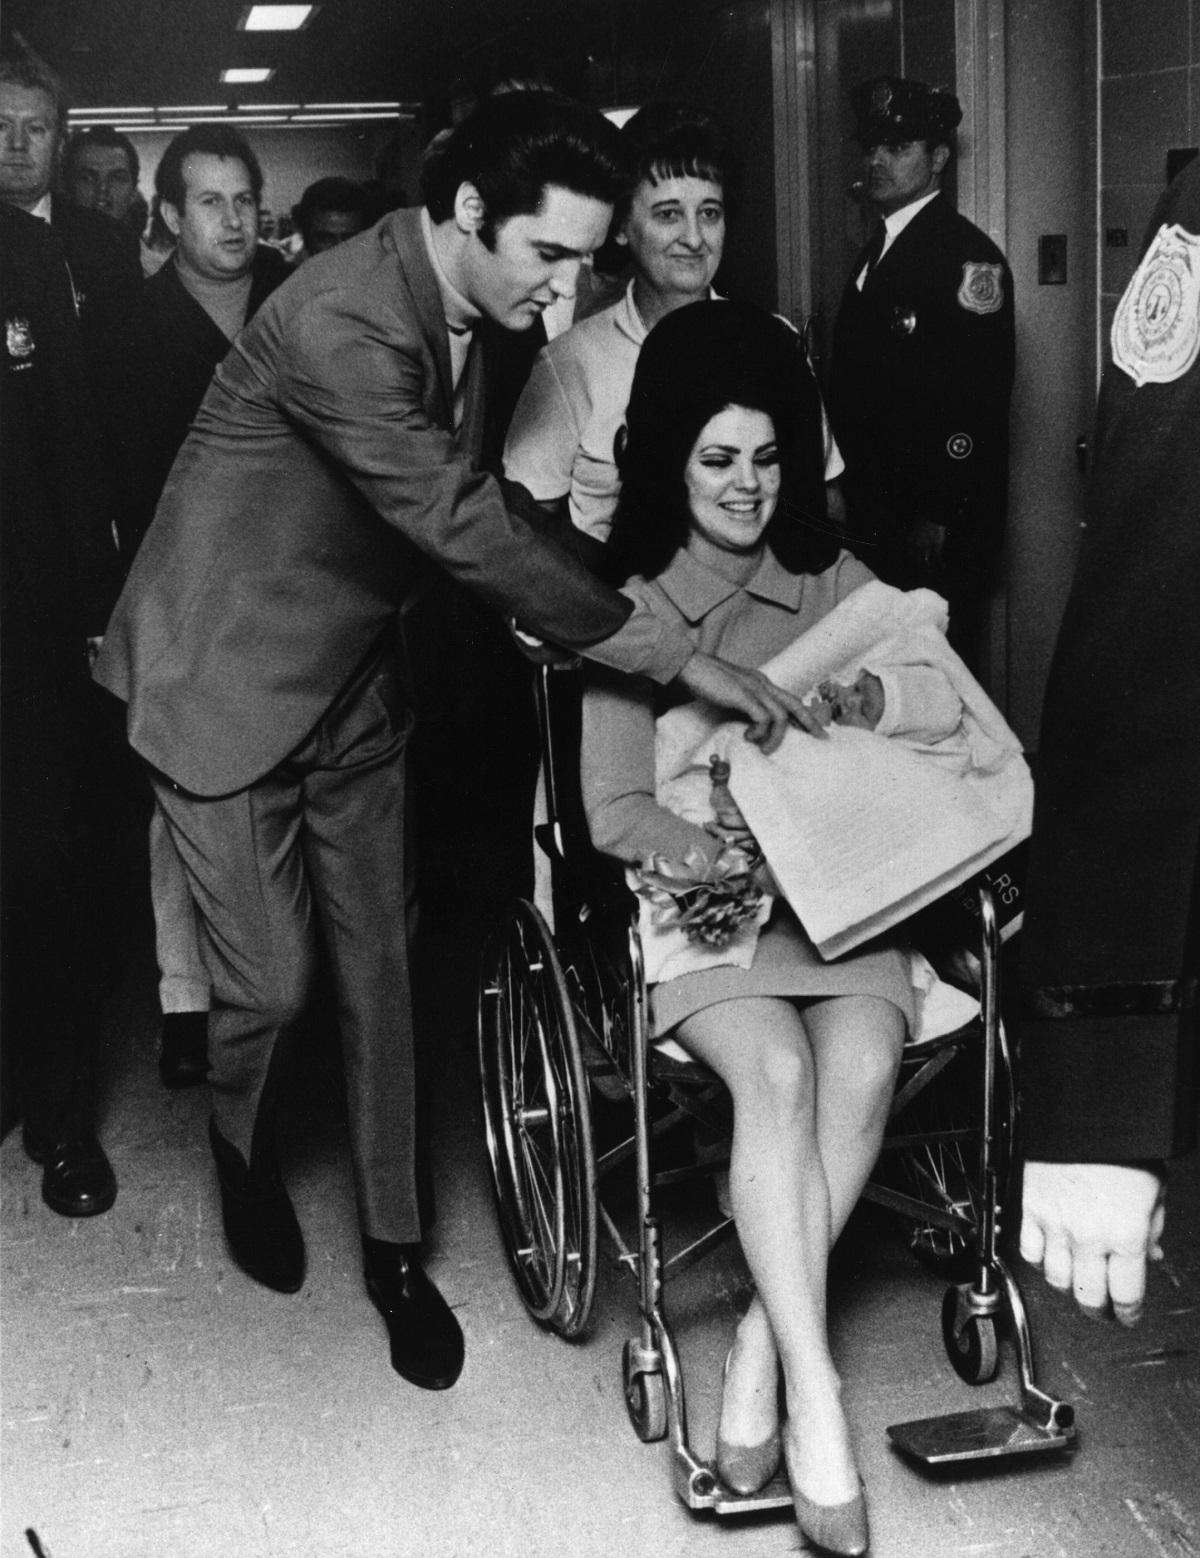 Elvis Presley and Priscilla Presley leaving the Baptist Hospital in Memphis with baby Lisa Marie Presley